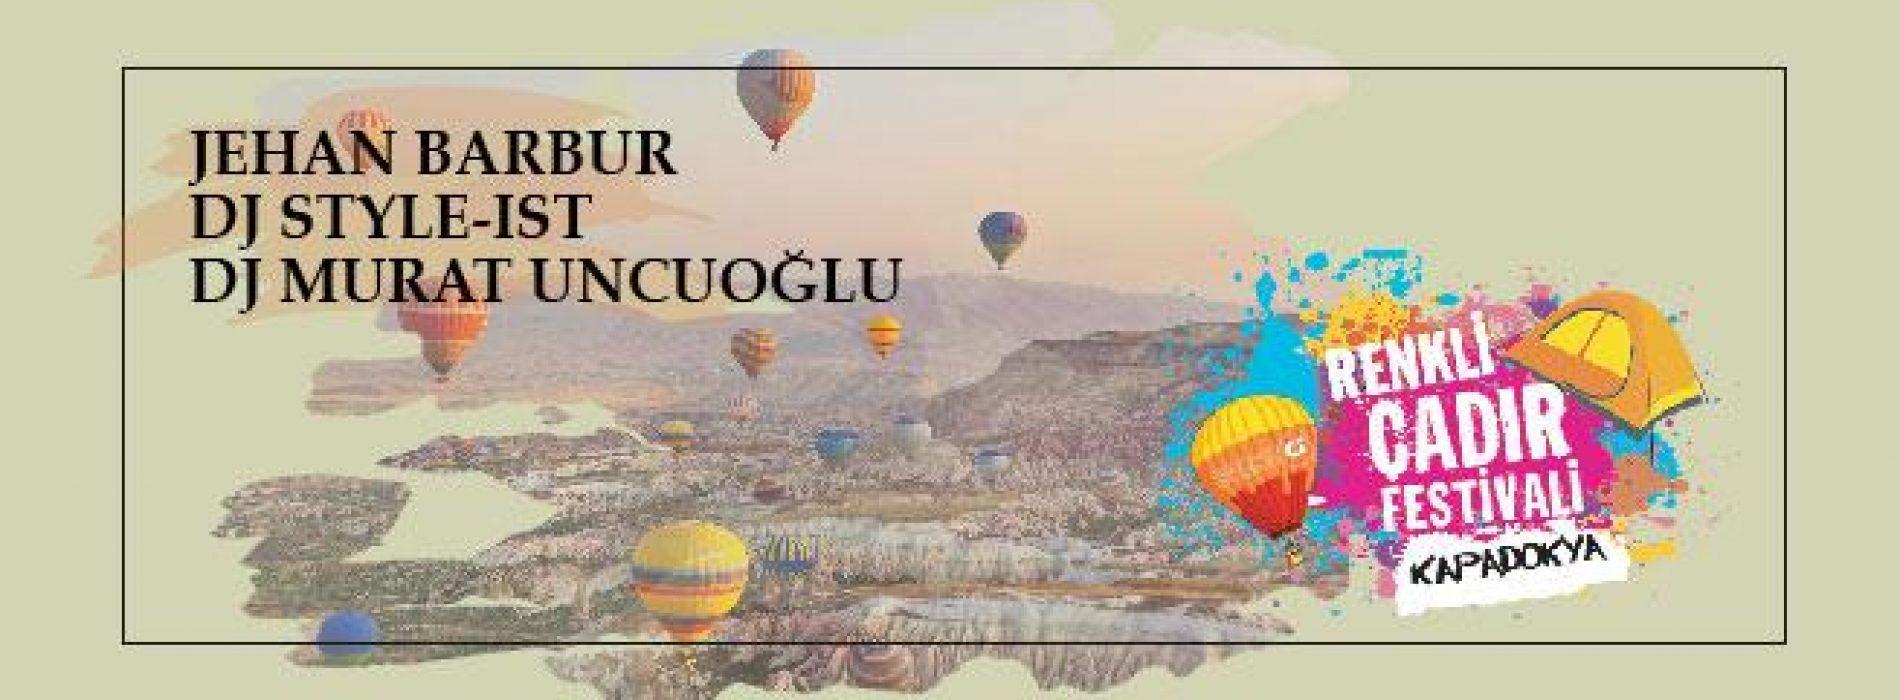 Renkli Çadır Festivali Duyuru